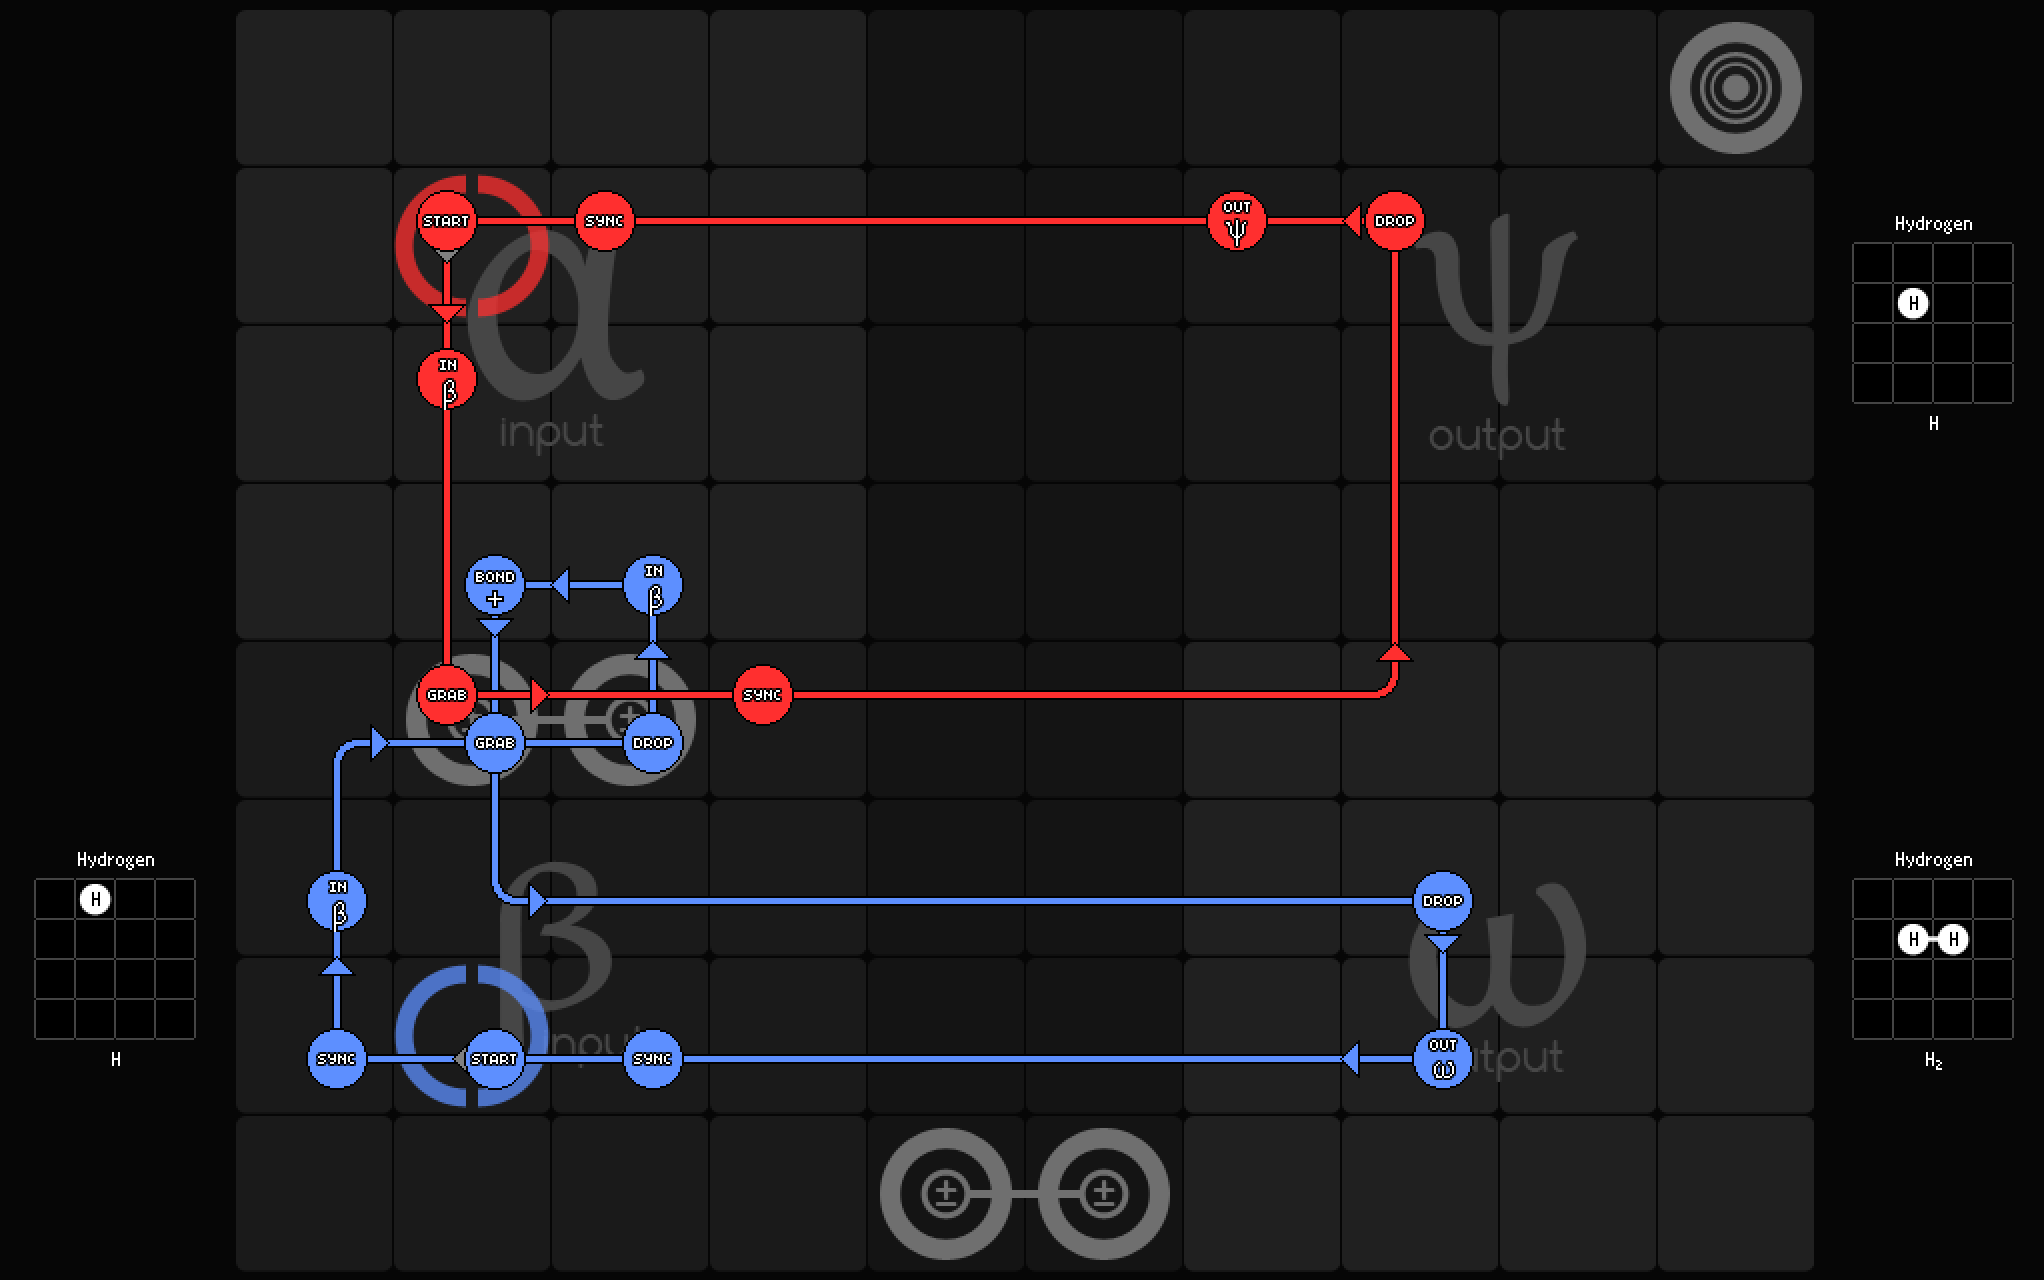 1_Story_Mode/5_Sikutar/SpaceChem-5.6.a-boss/Reactor_3.png